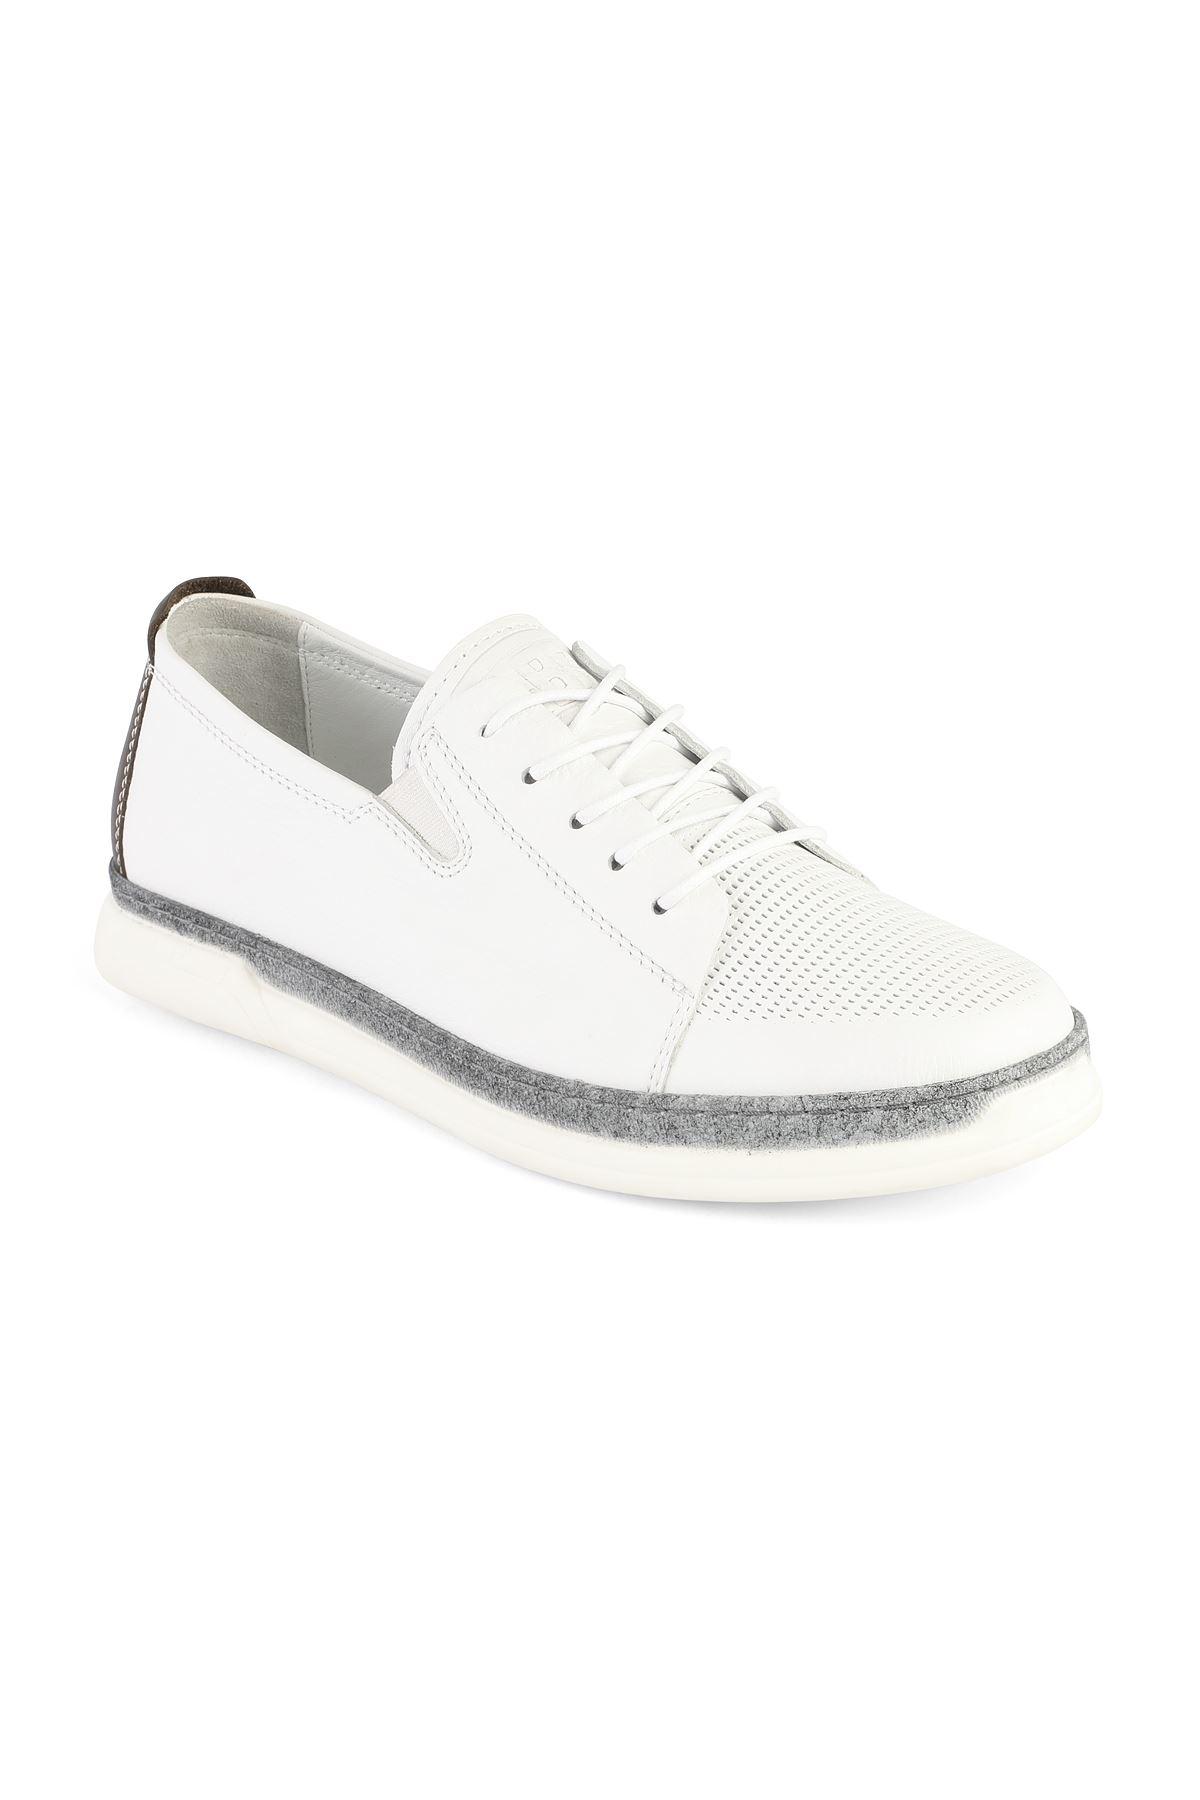 Libero 3307 White Loafer Shoes